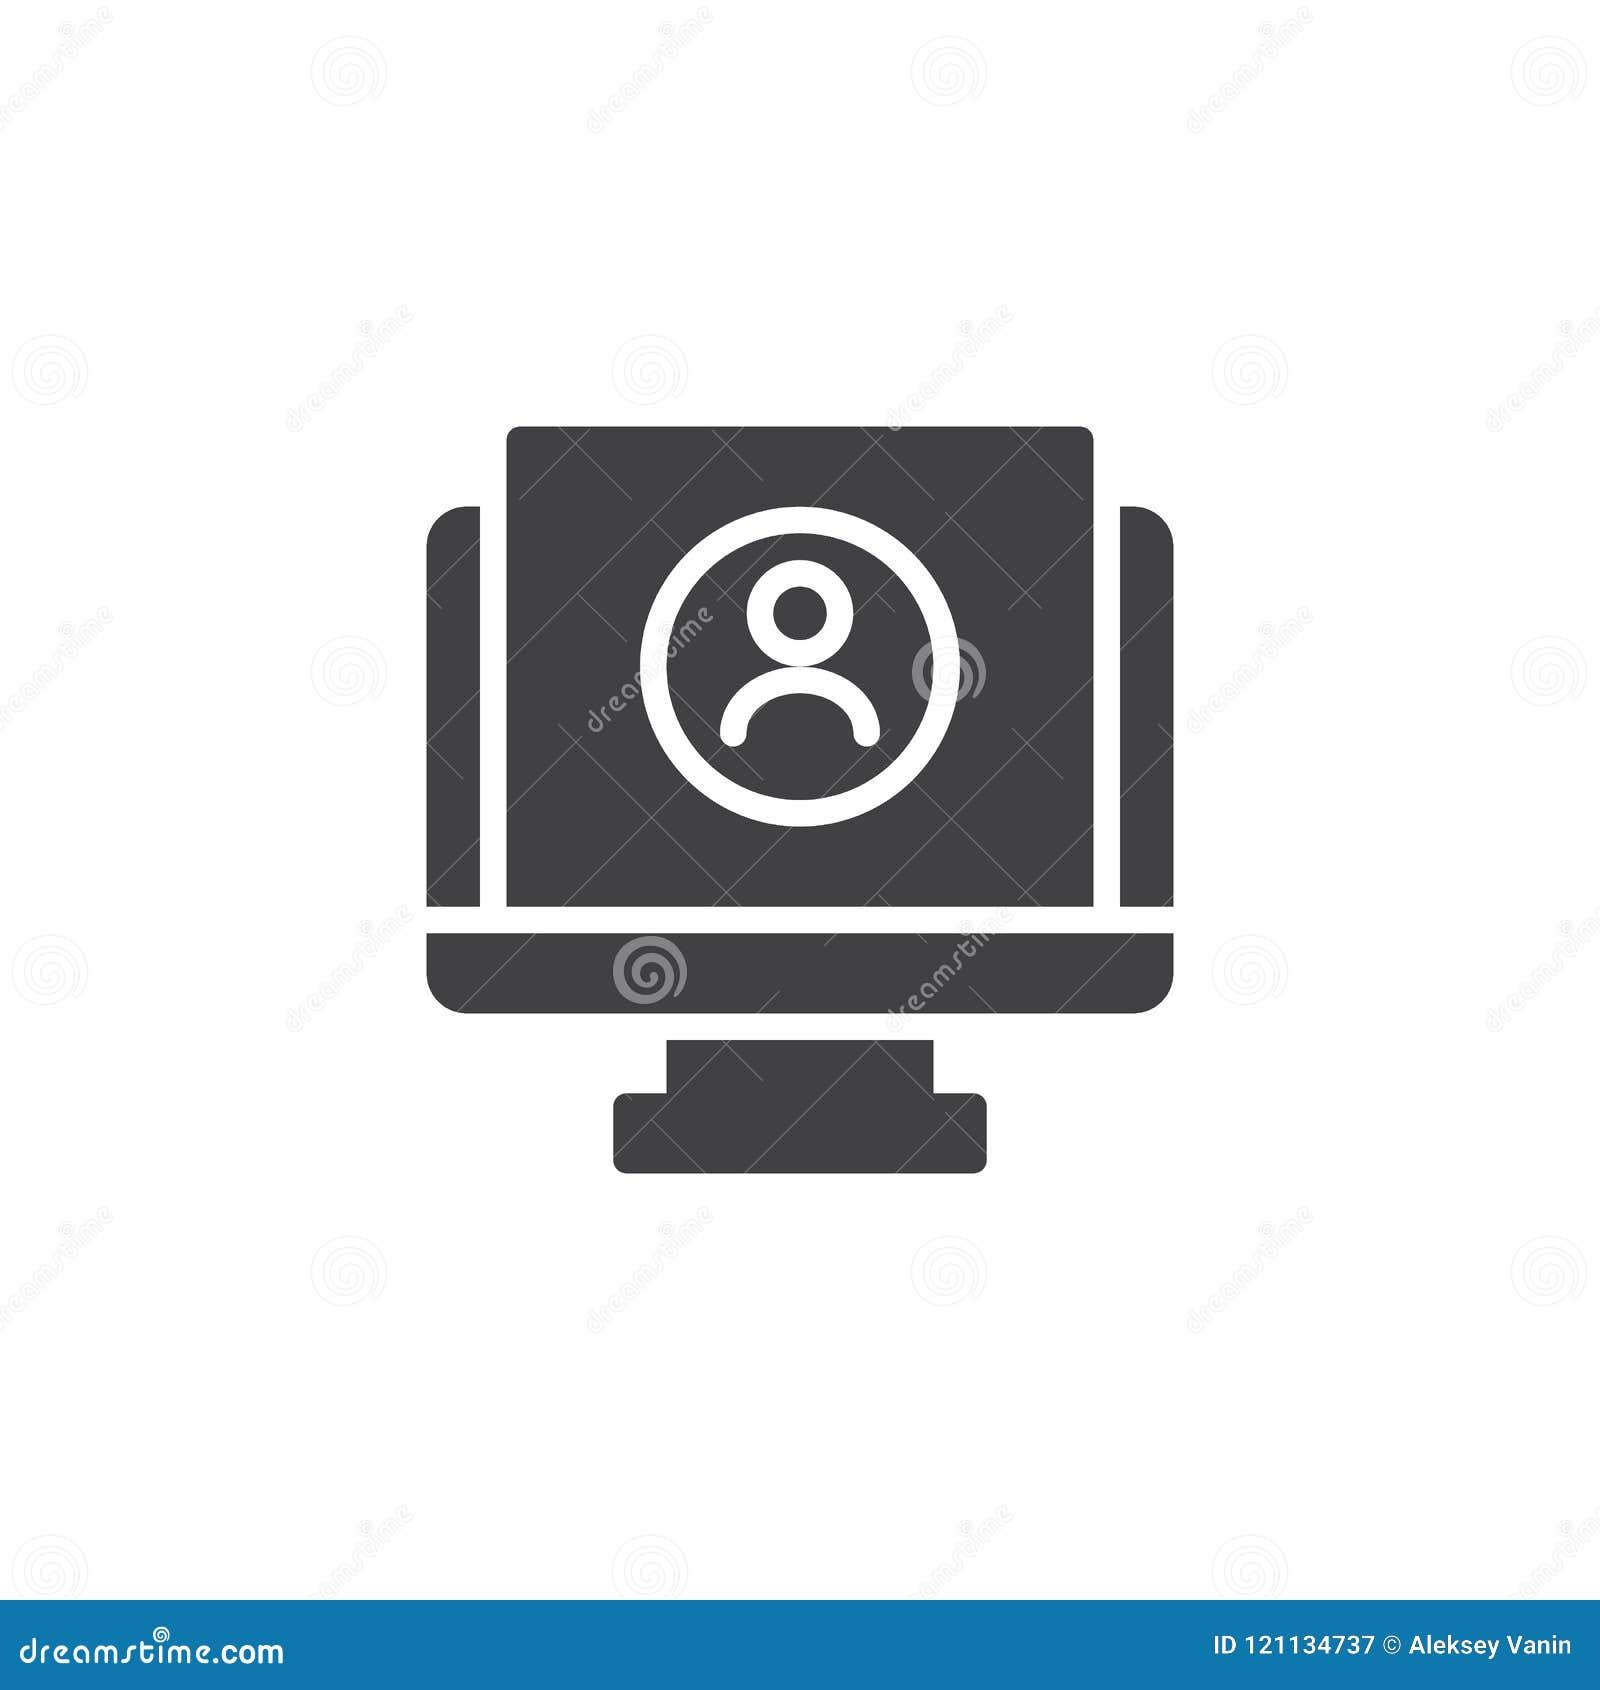 Resume CV Monitor Vector Icon Stock Vector - Illustration of office ...